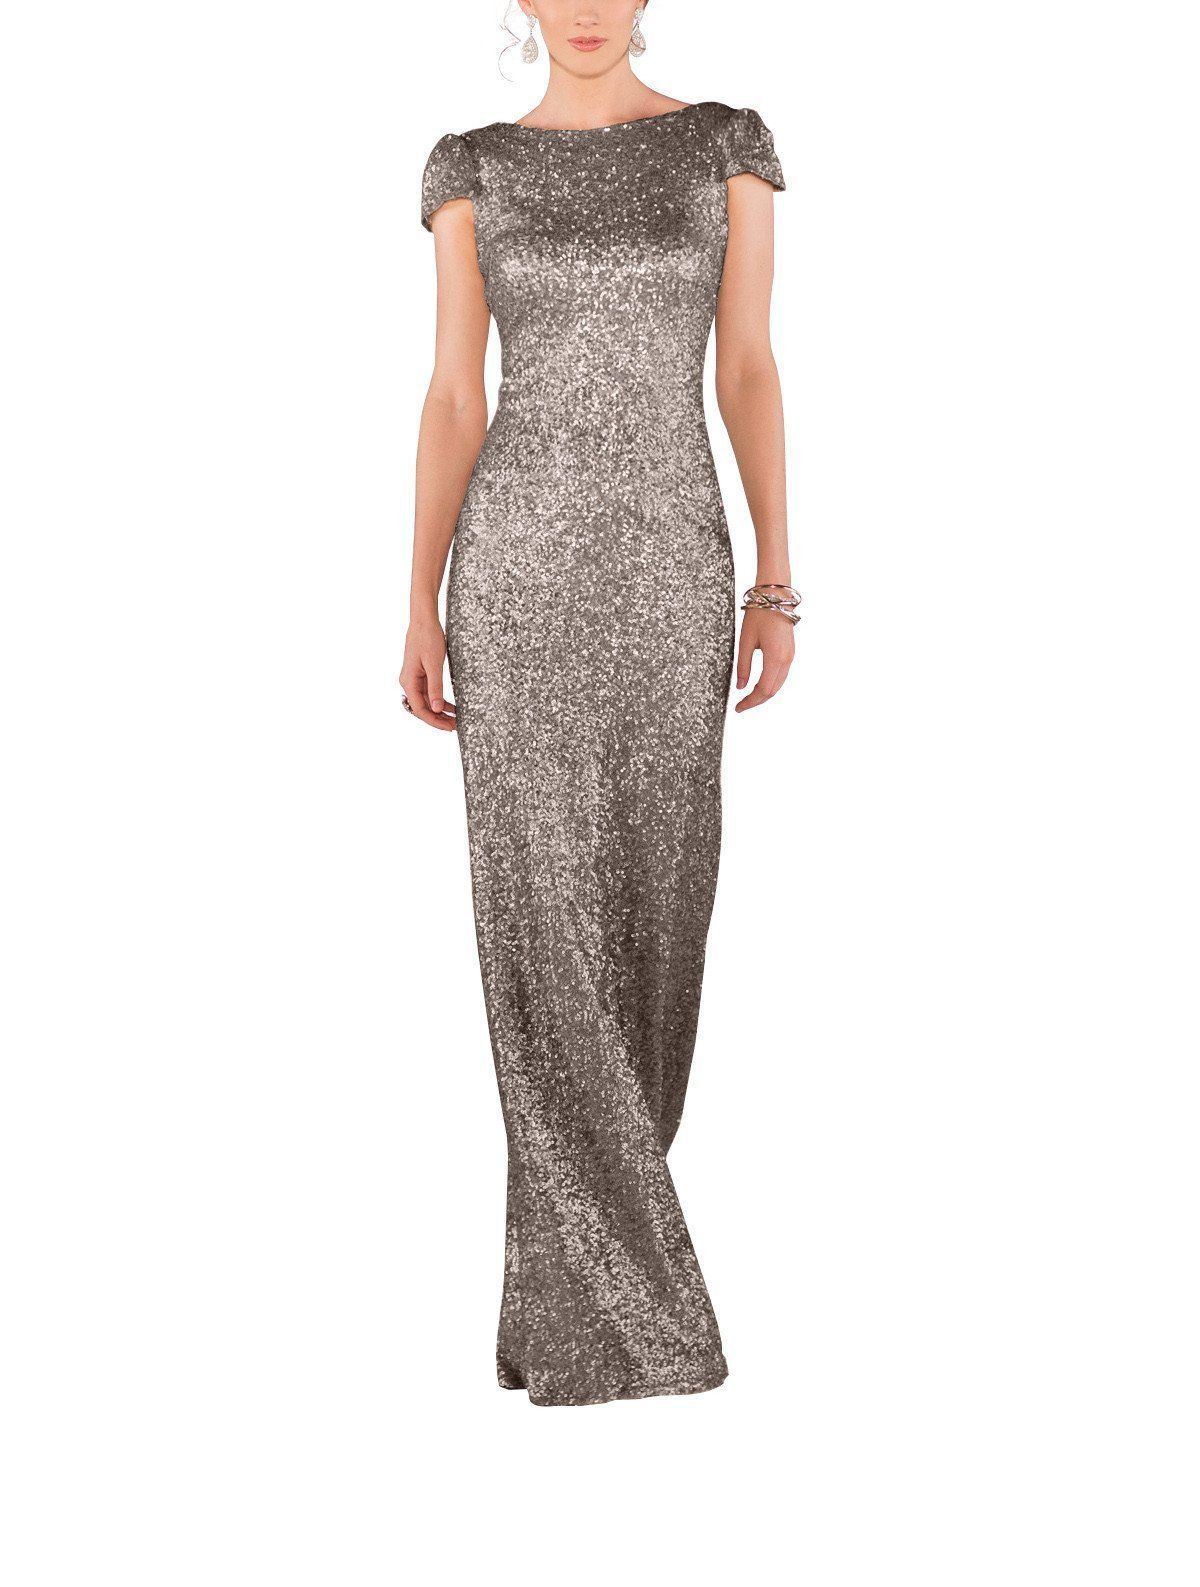 Sorella vita modern metallic style dresses pinterest